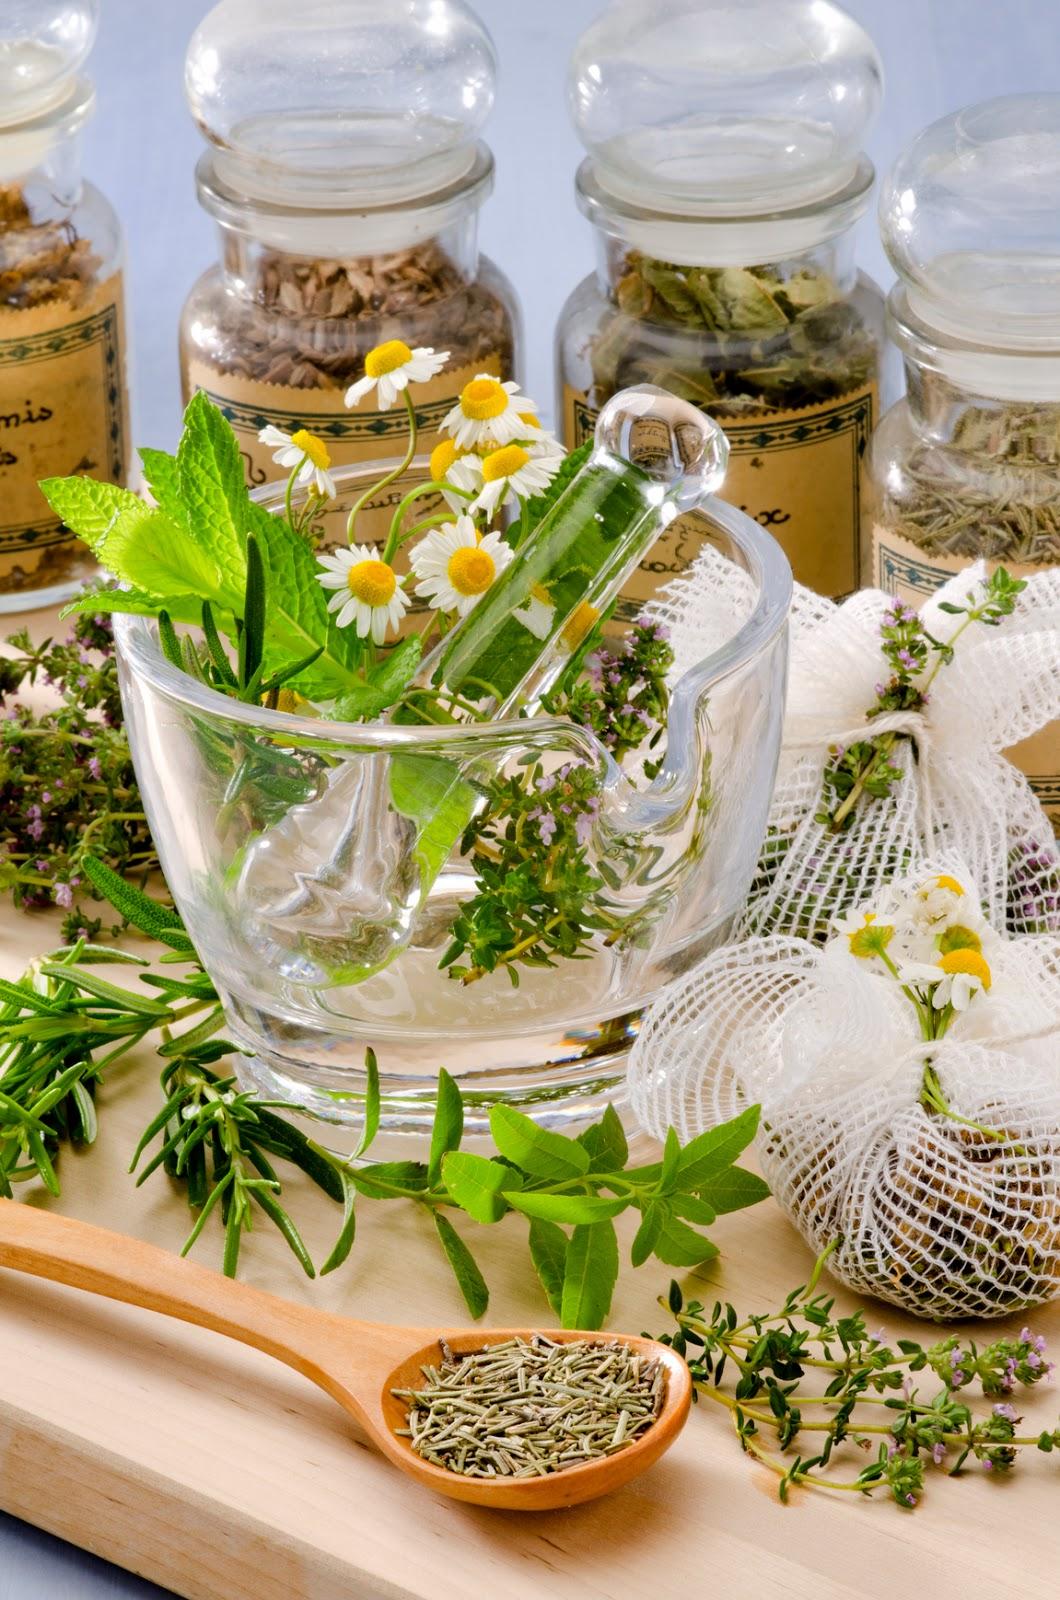 Image result for history of herbal medicine